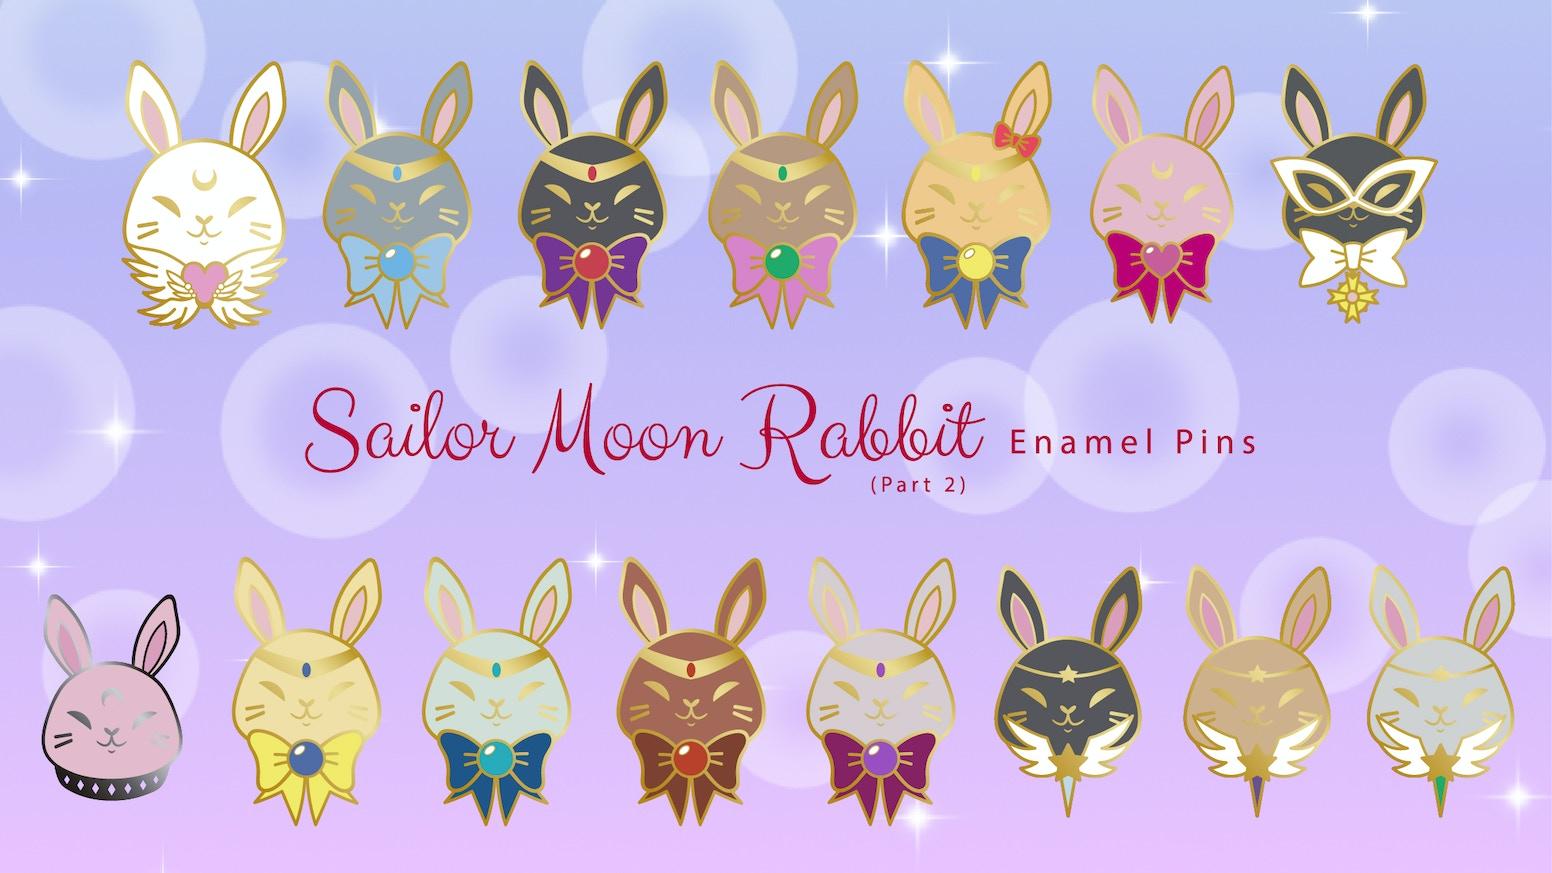 Sailor Moon Rabbit Enamel Pins (Part 2)